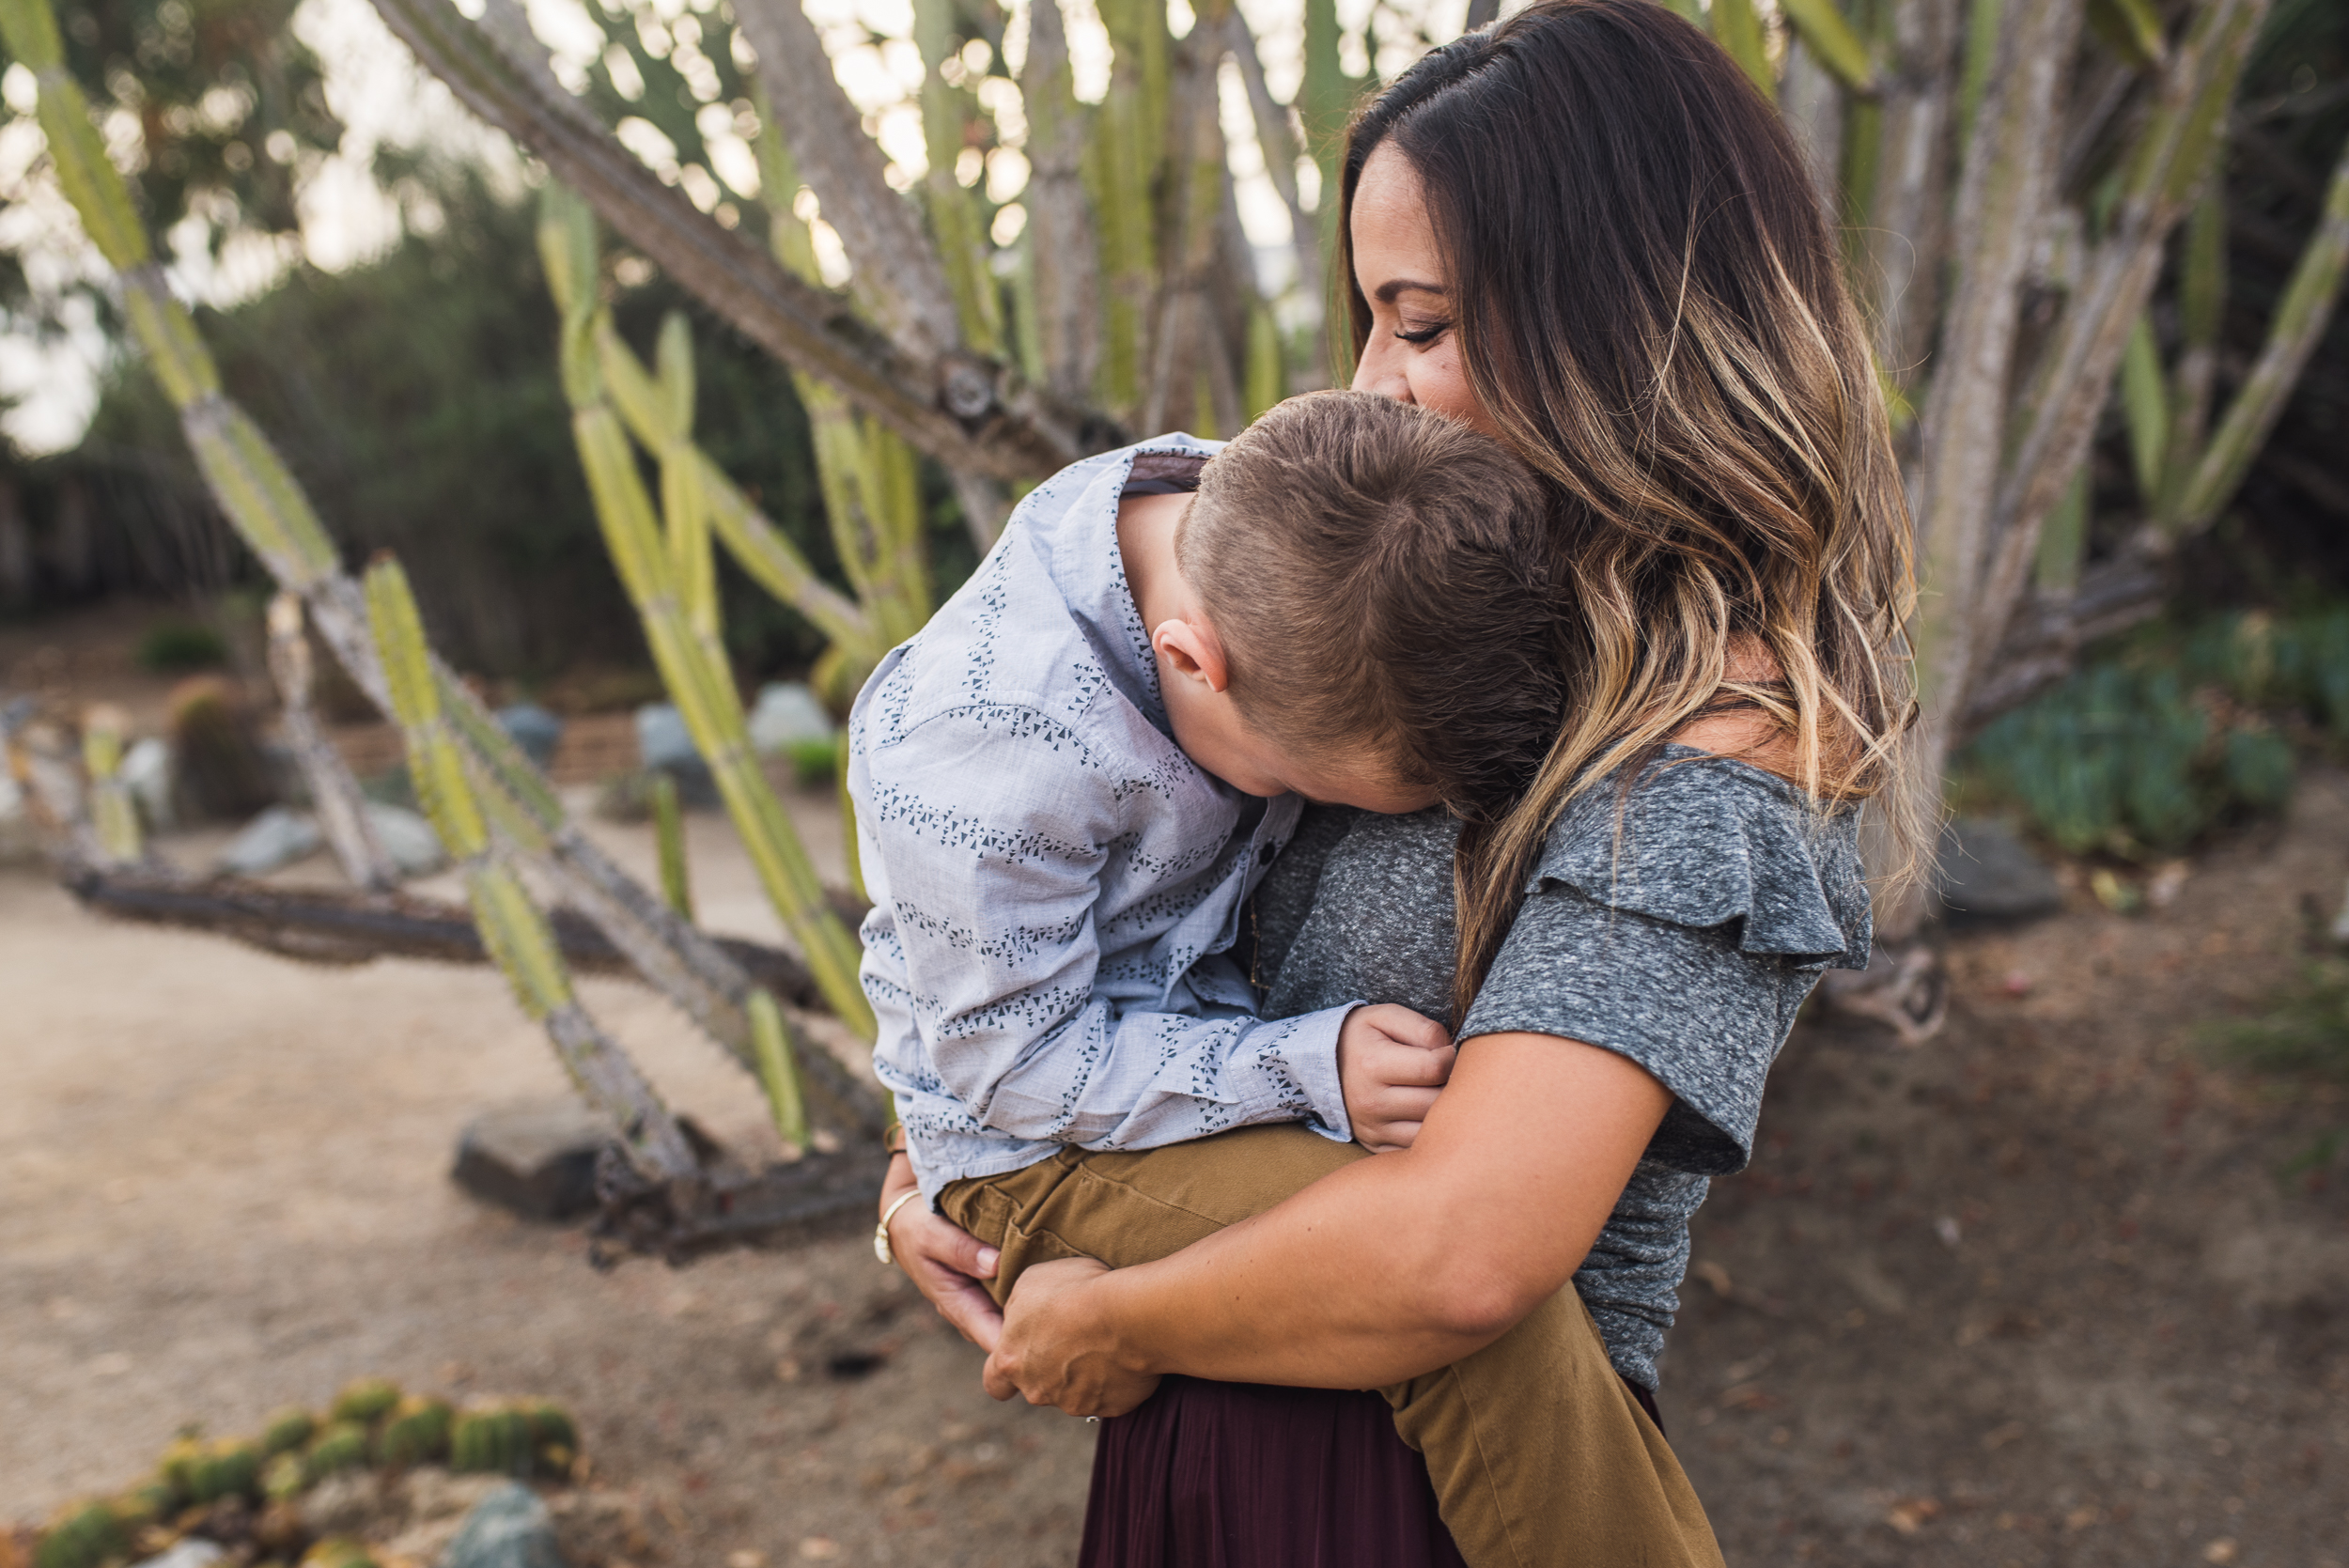 2018-San-Diego-Family-Lifestyle-Newborn-Travel-Vacation-Photographer-Kelsey-Smith-Photography-Coronado-La-Jolla-Encinitas-Solana-Beach-Del-Mar-104.jpg